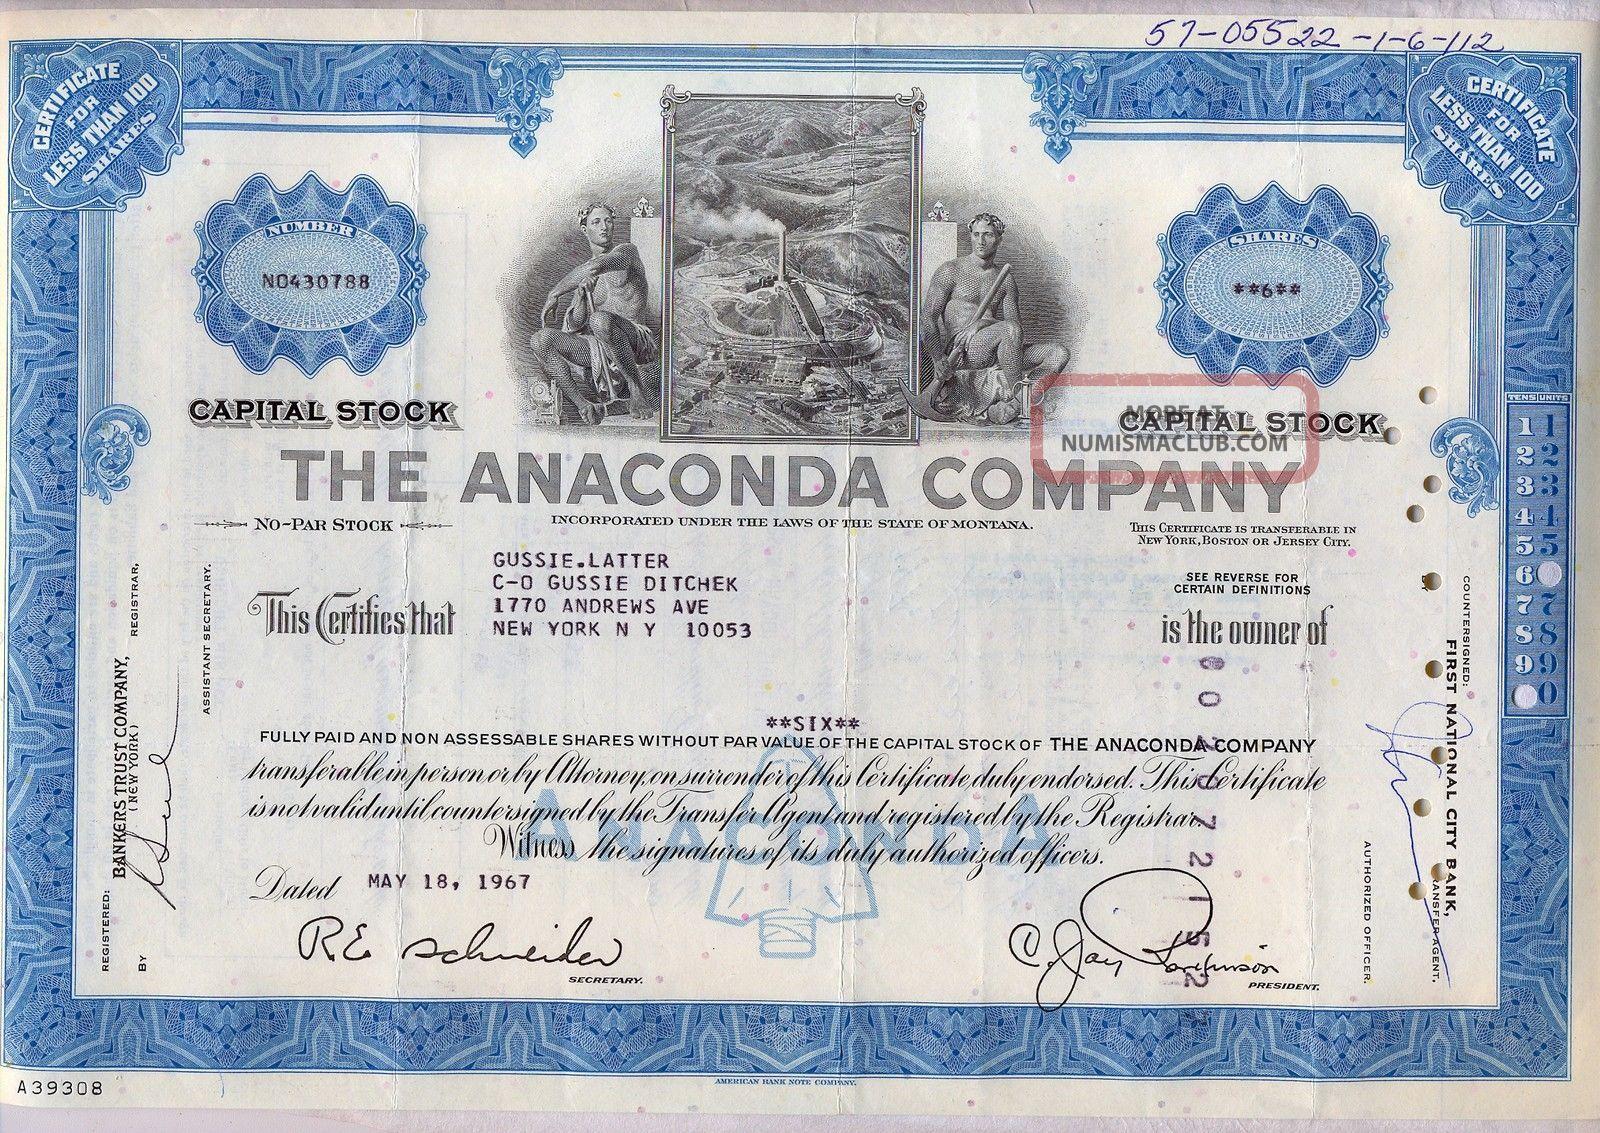 Anaconda Copper Mining Company Stock Certificate Stocks & Bonds, Scripophily photo